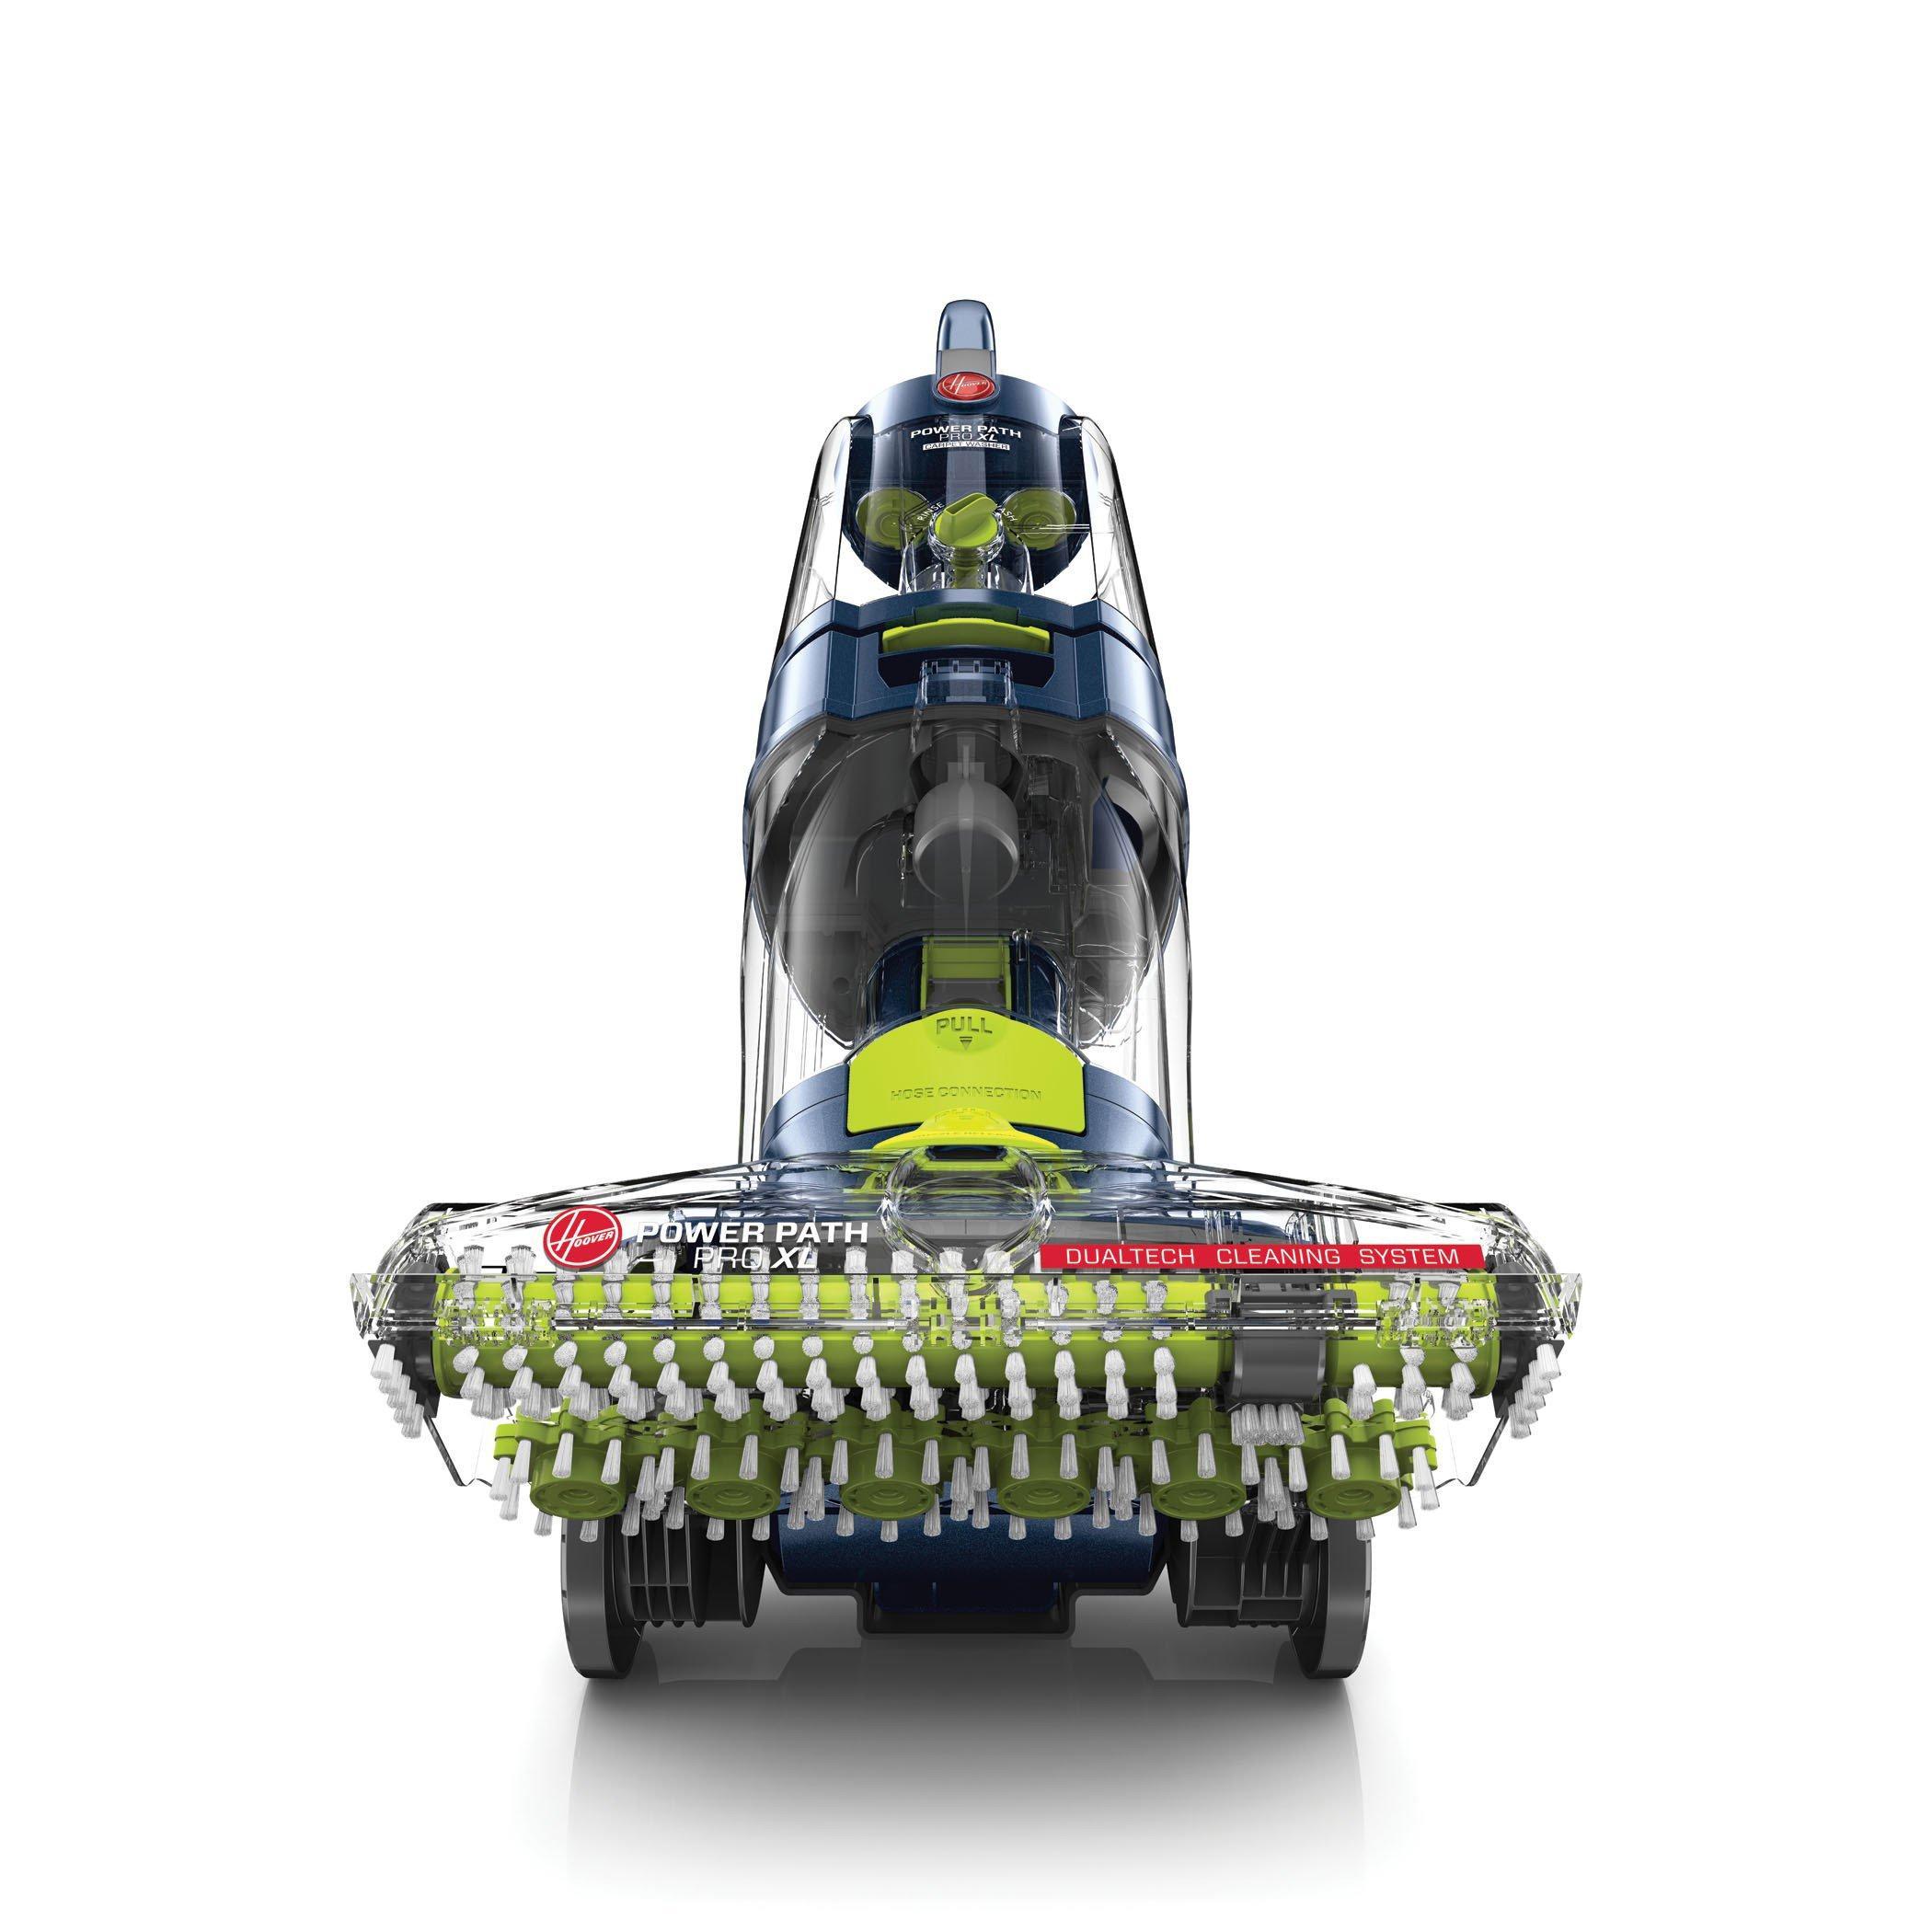 Power Path Pro XL Carpet Cleaner3